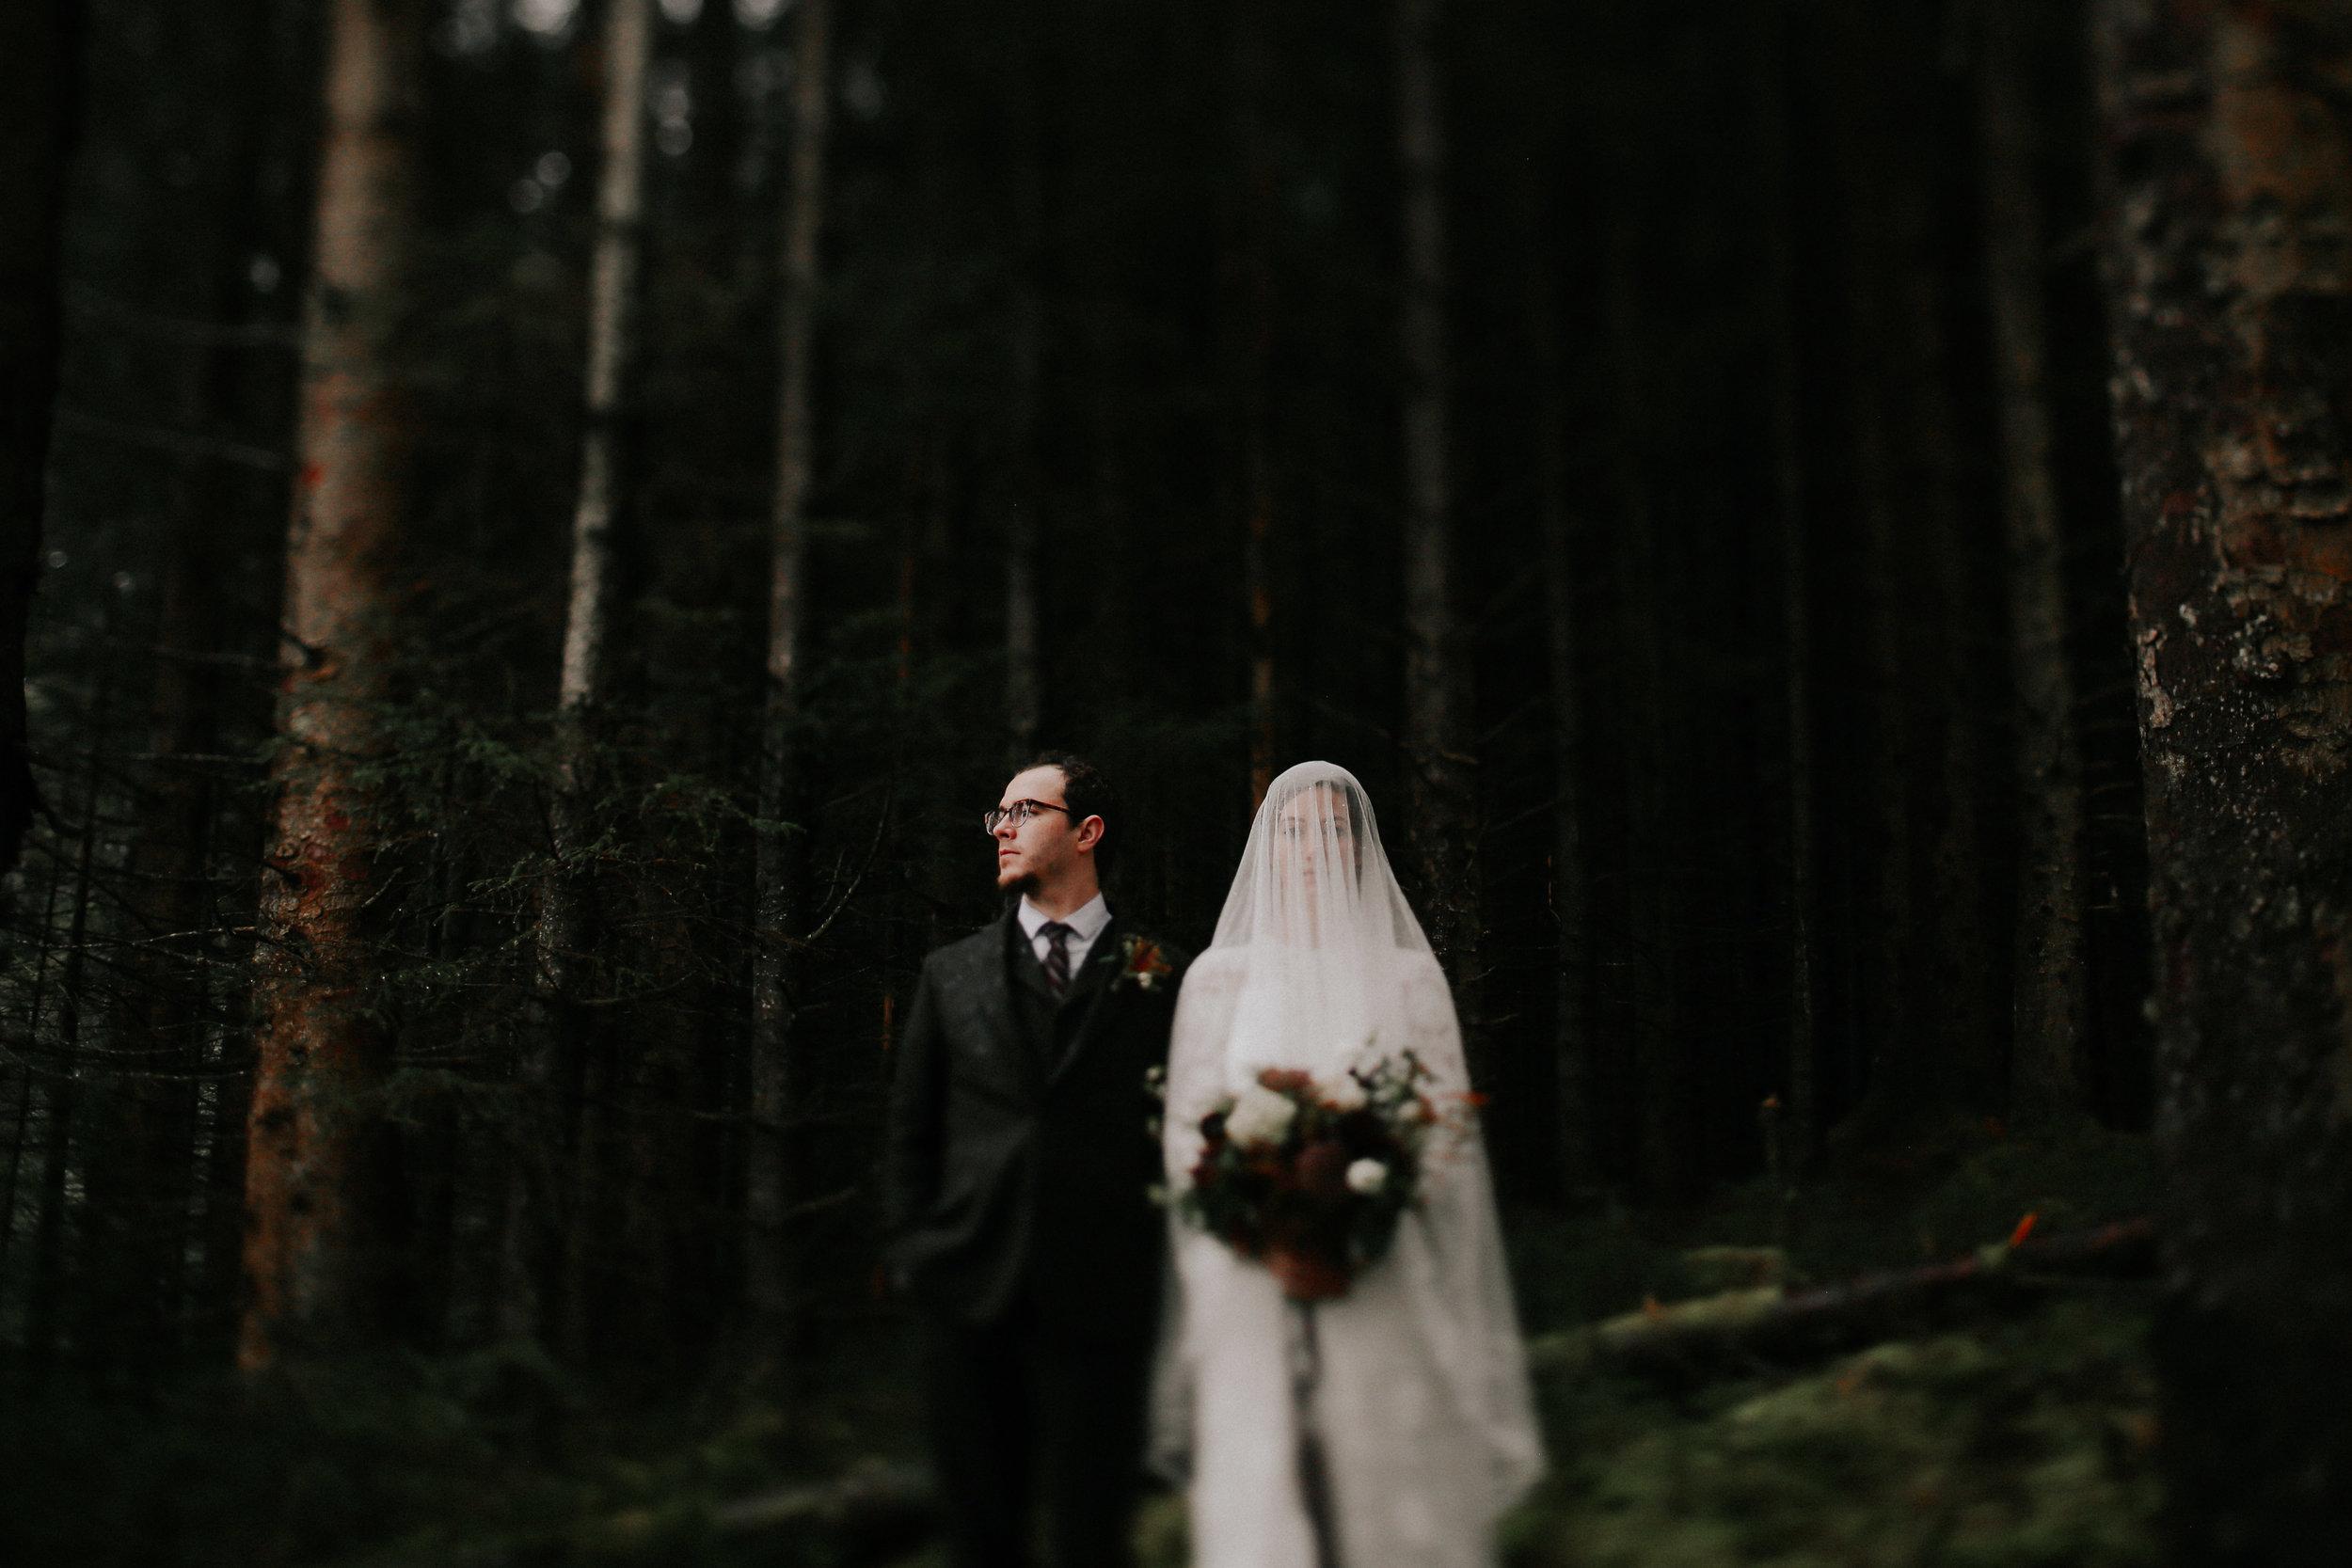 Scotland_Elopement_Melissa_Marshall_Photography_49.jpg